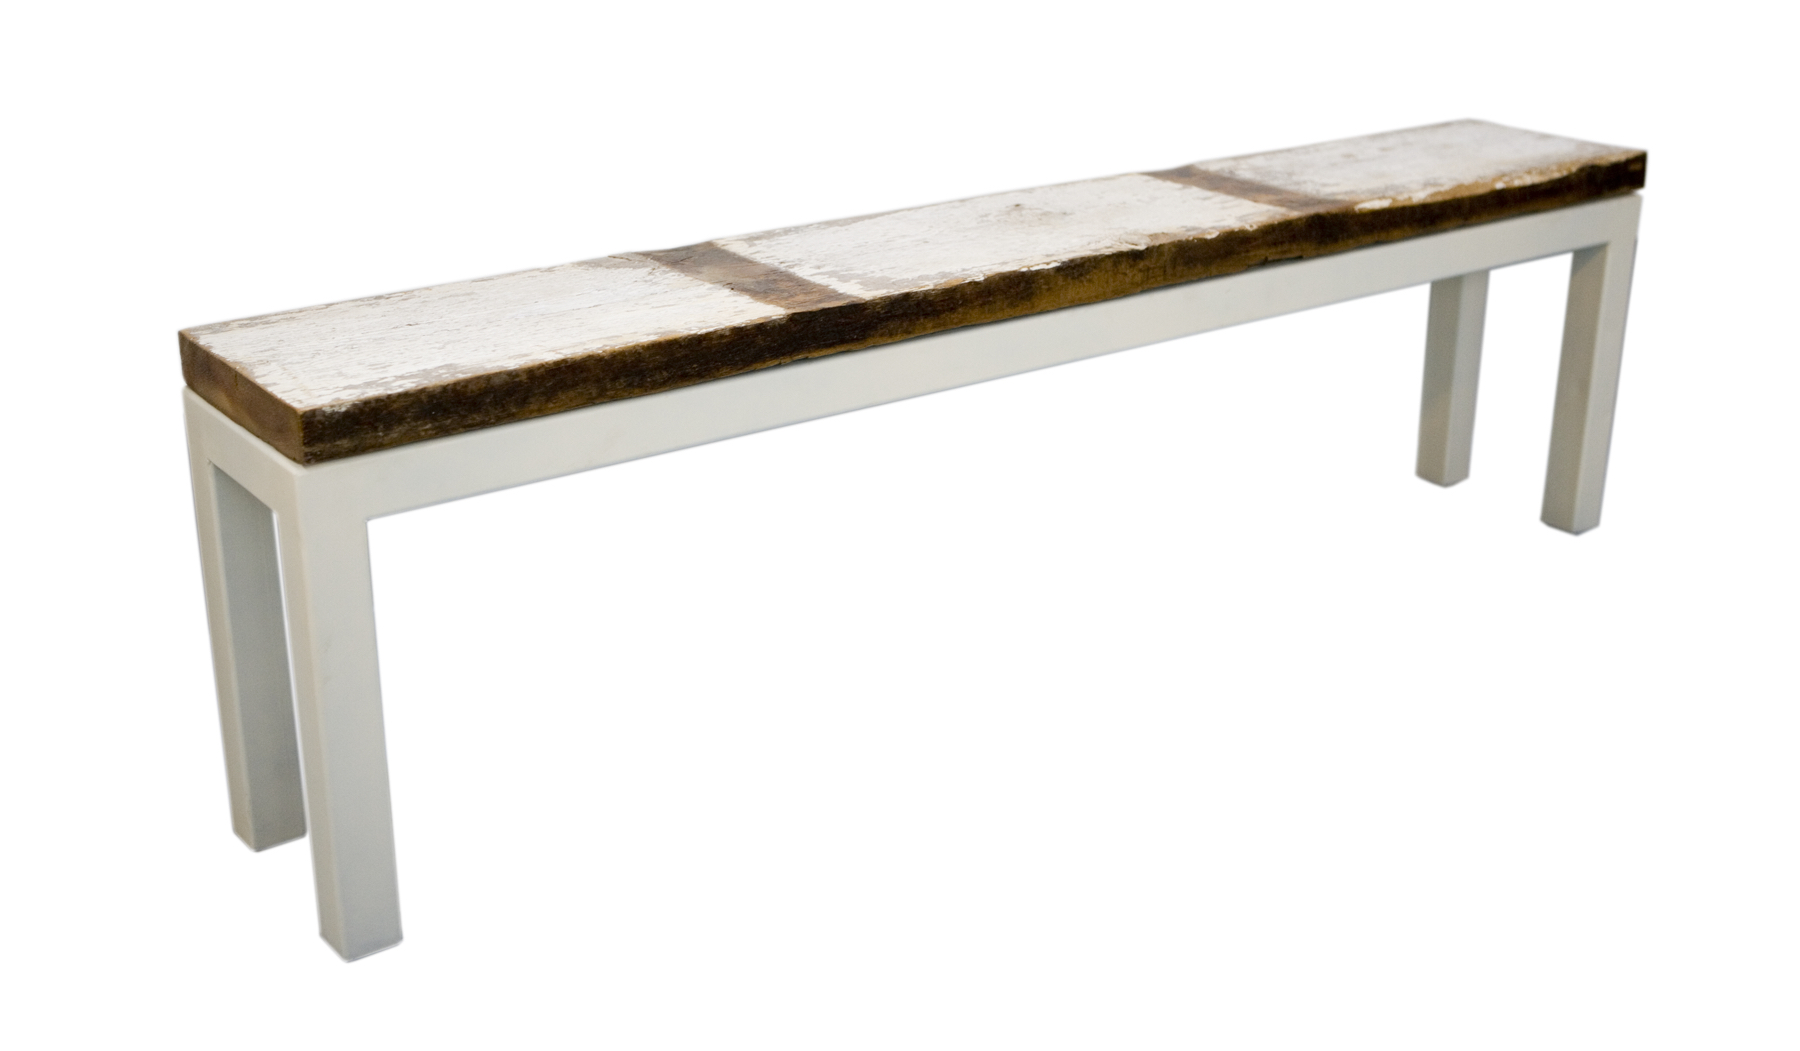 white bench.1 white copy 3.jpg